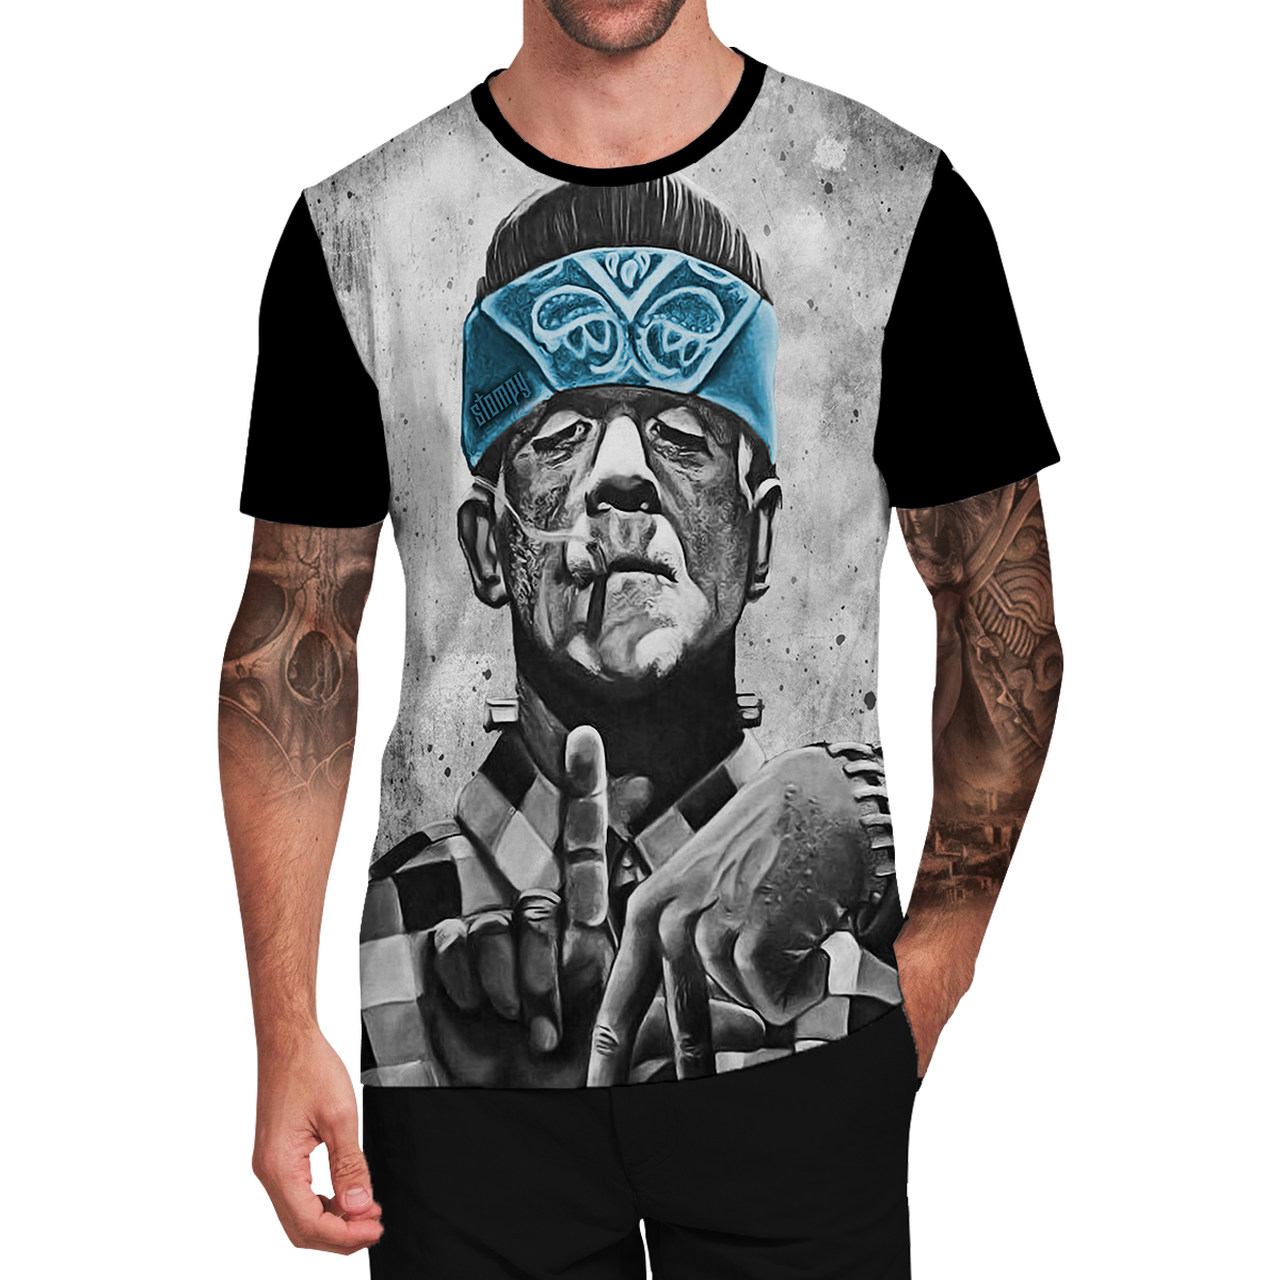 Stompy Camiseta Tattoo Tatuagem Caveira Skull 156